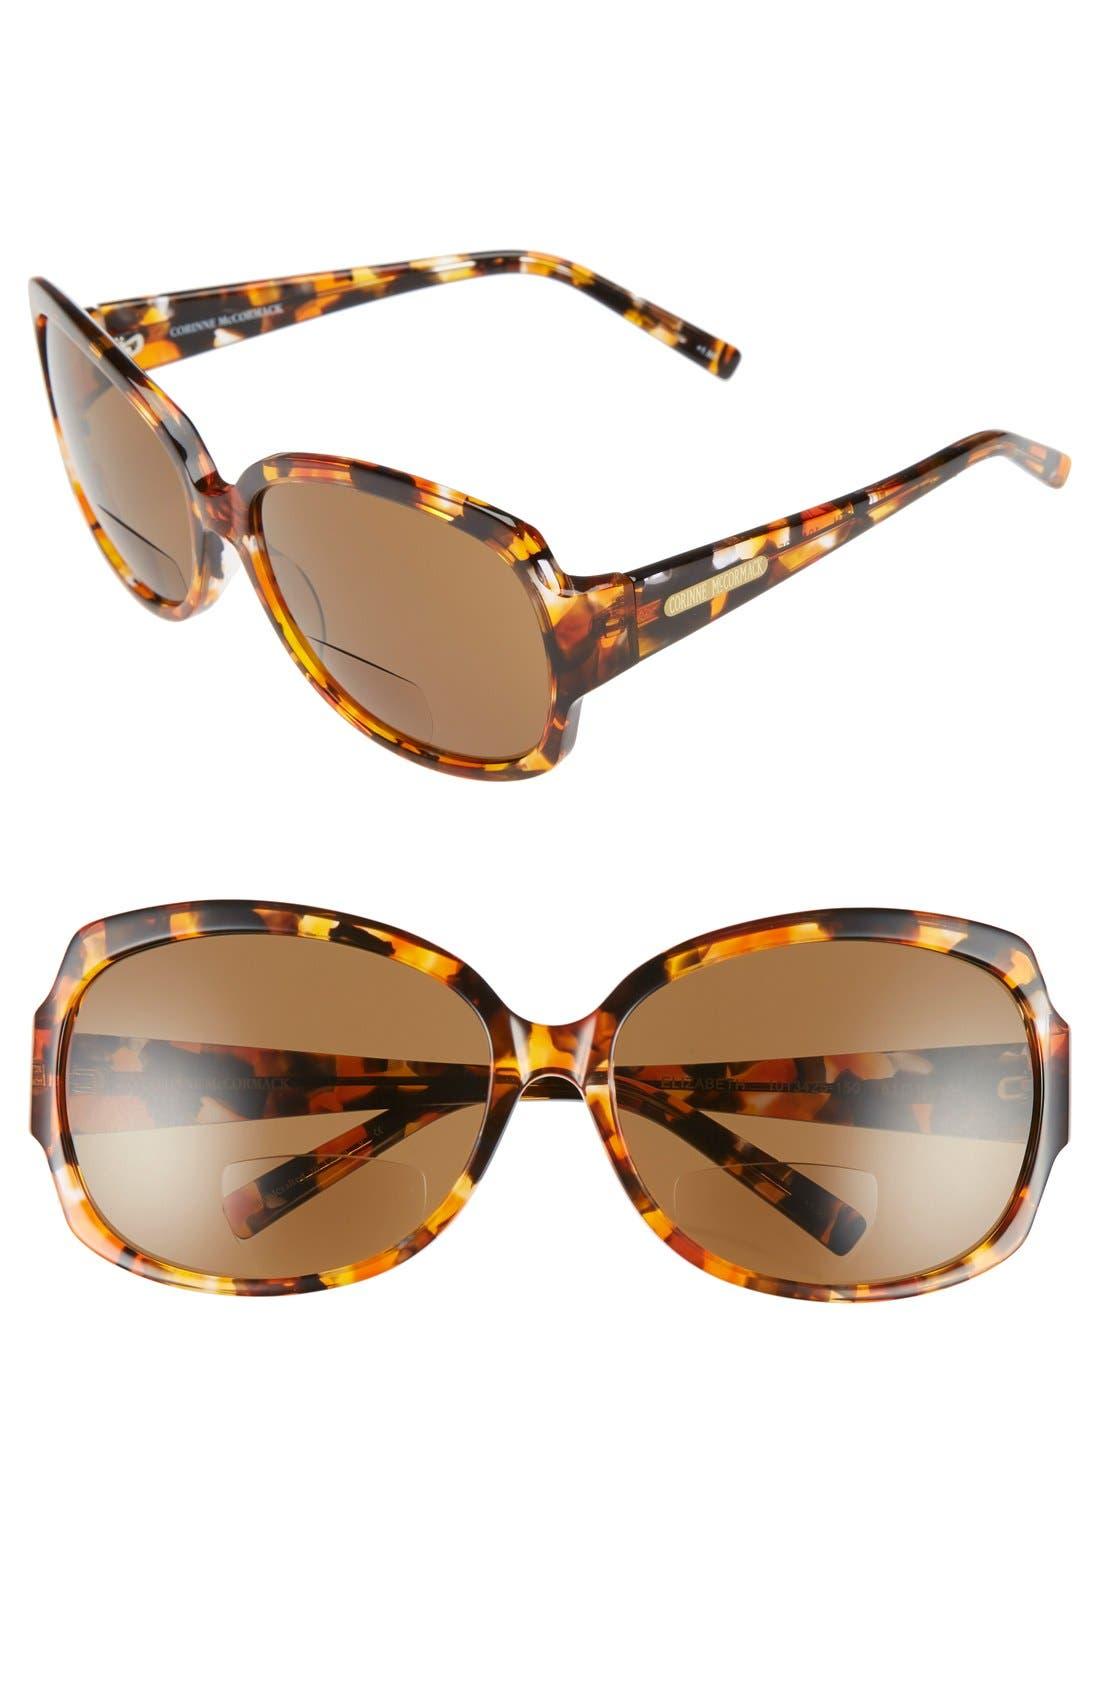 Alternate Image 1 Selected - Corinne McCormack 'Elizabeth' 61mm Reading Sunglasses